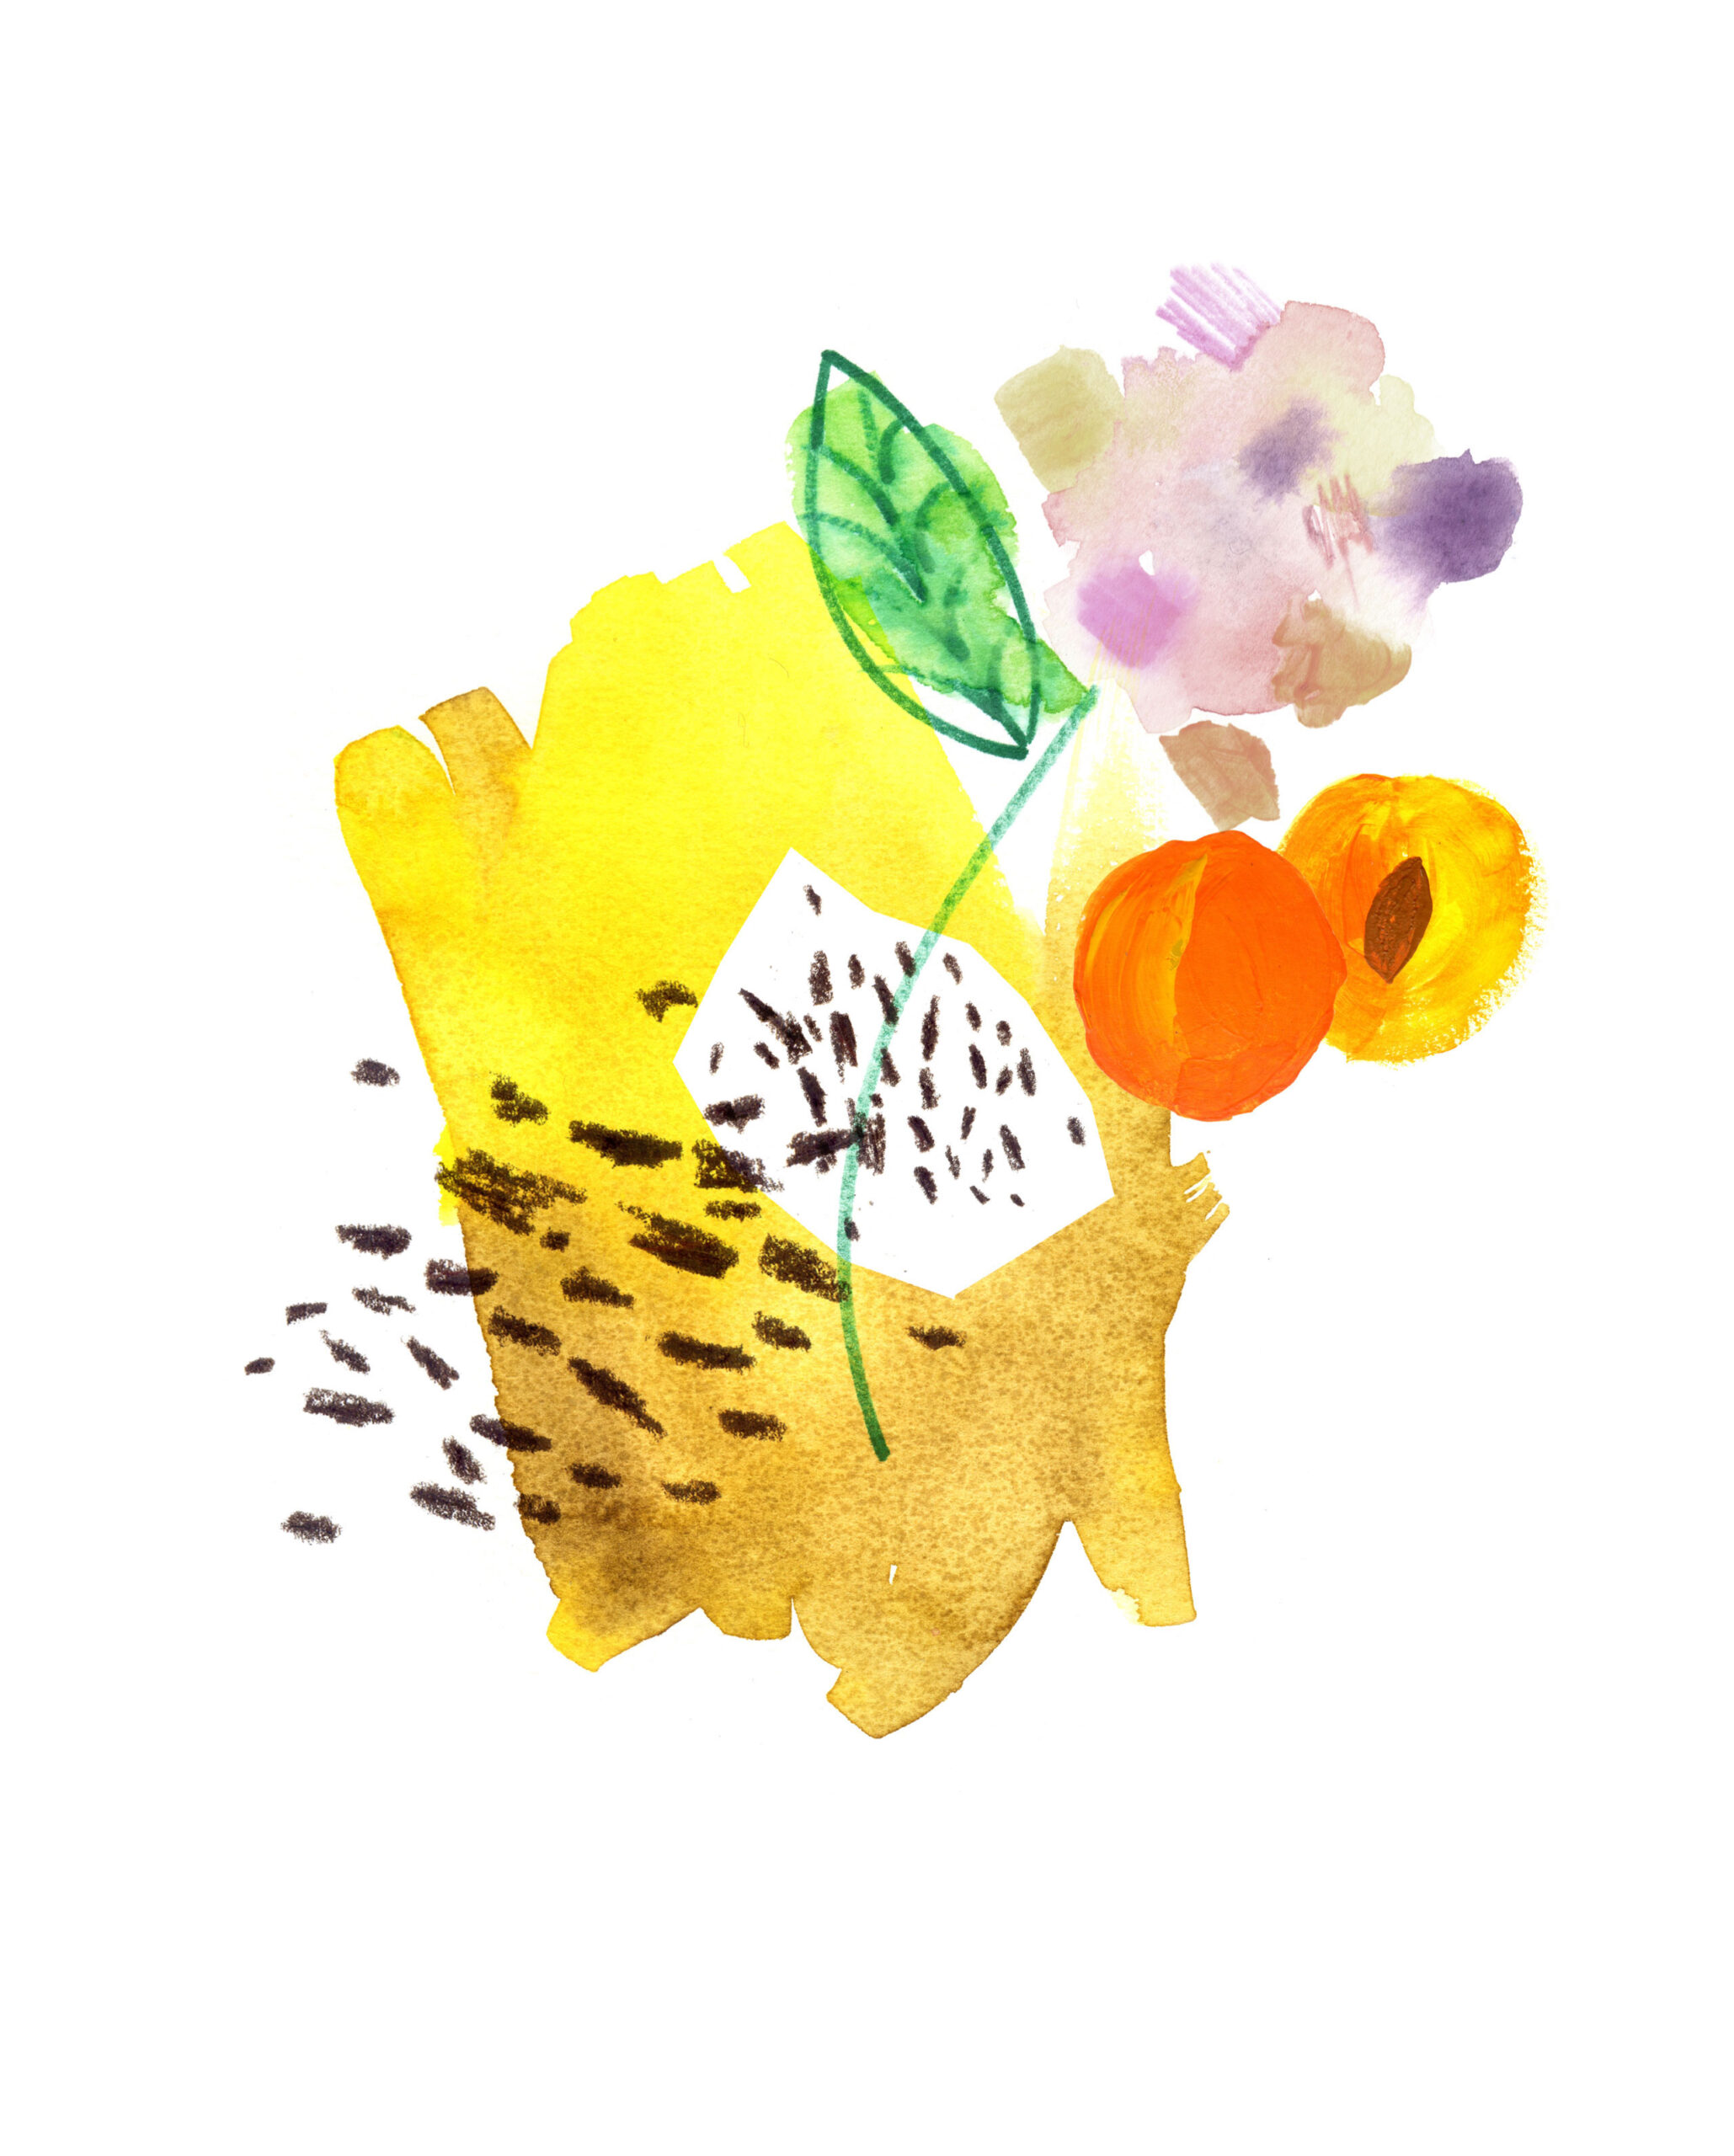 Coffee illustration – Heka London, sensory design studio